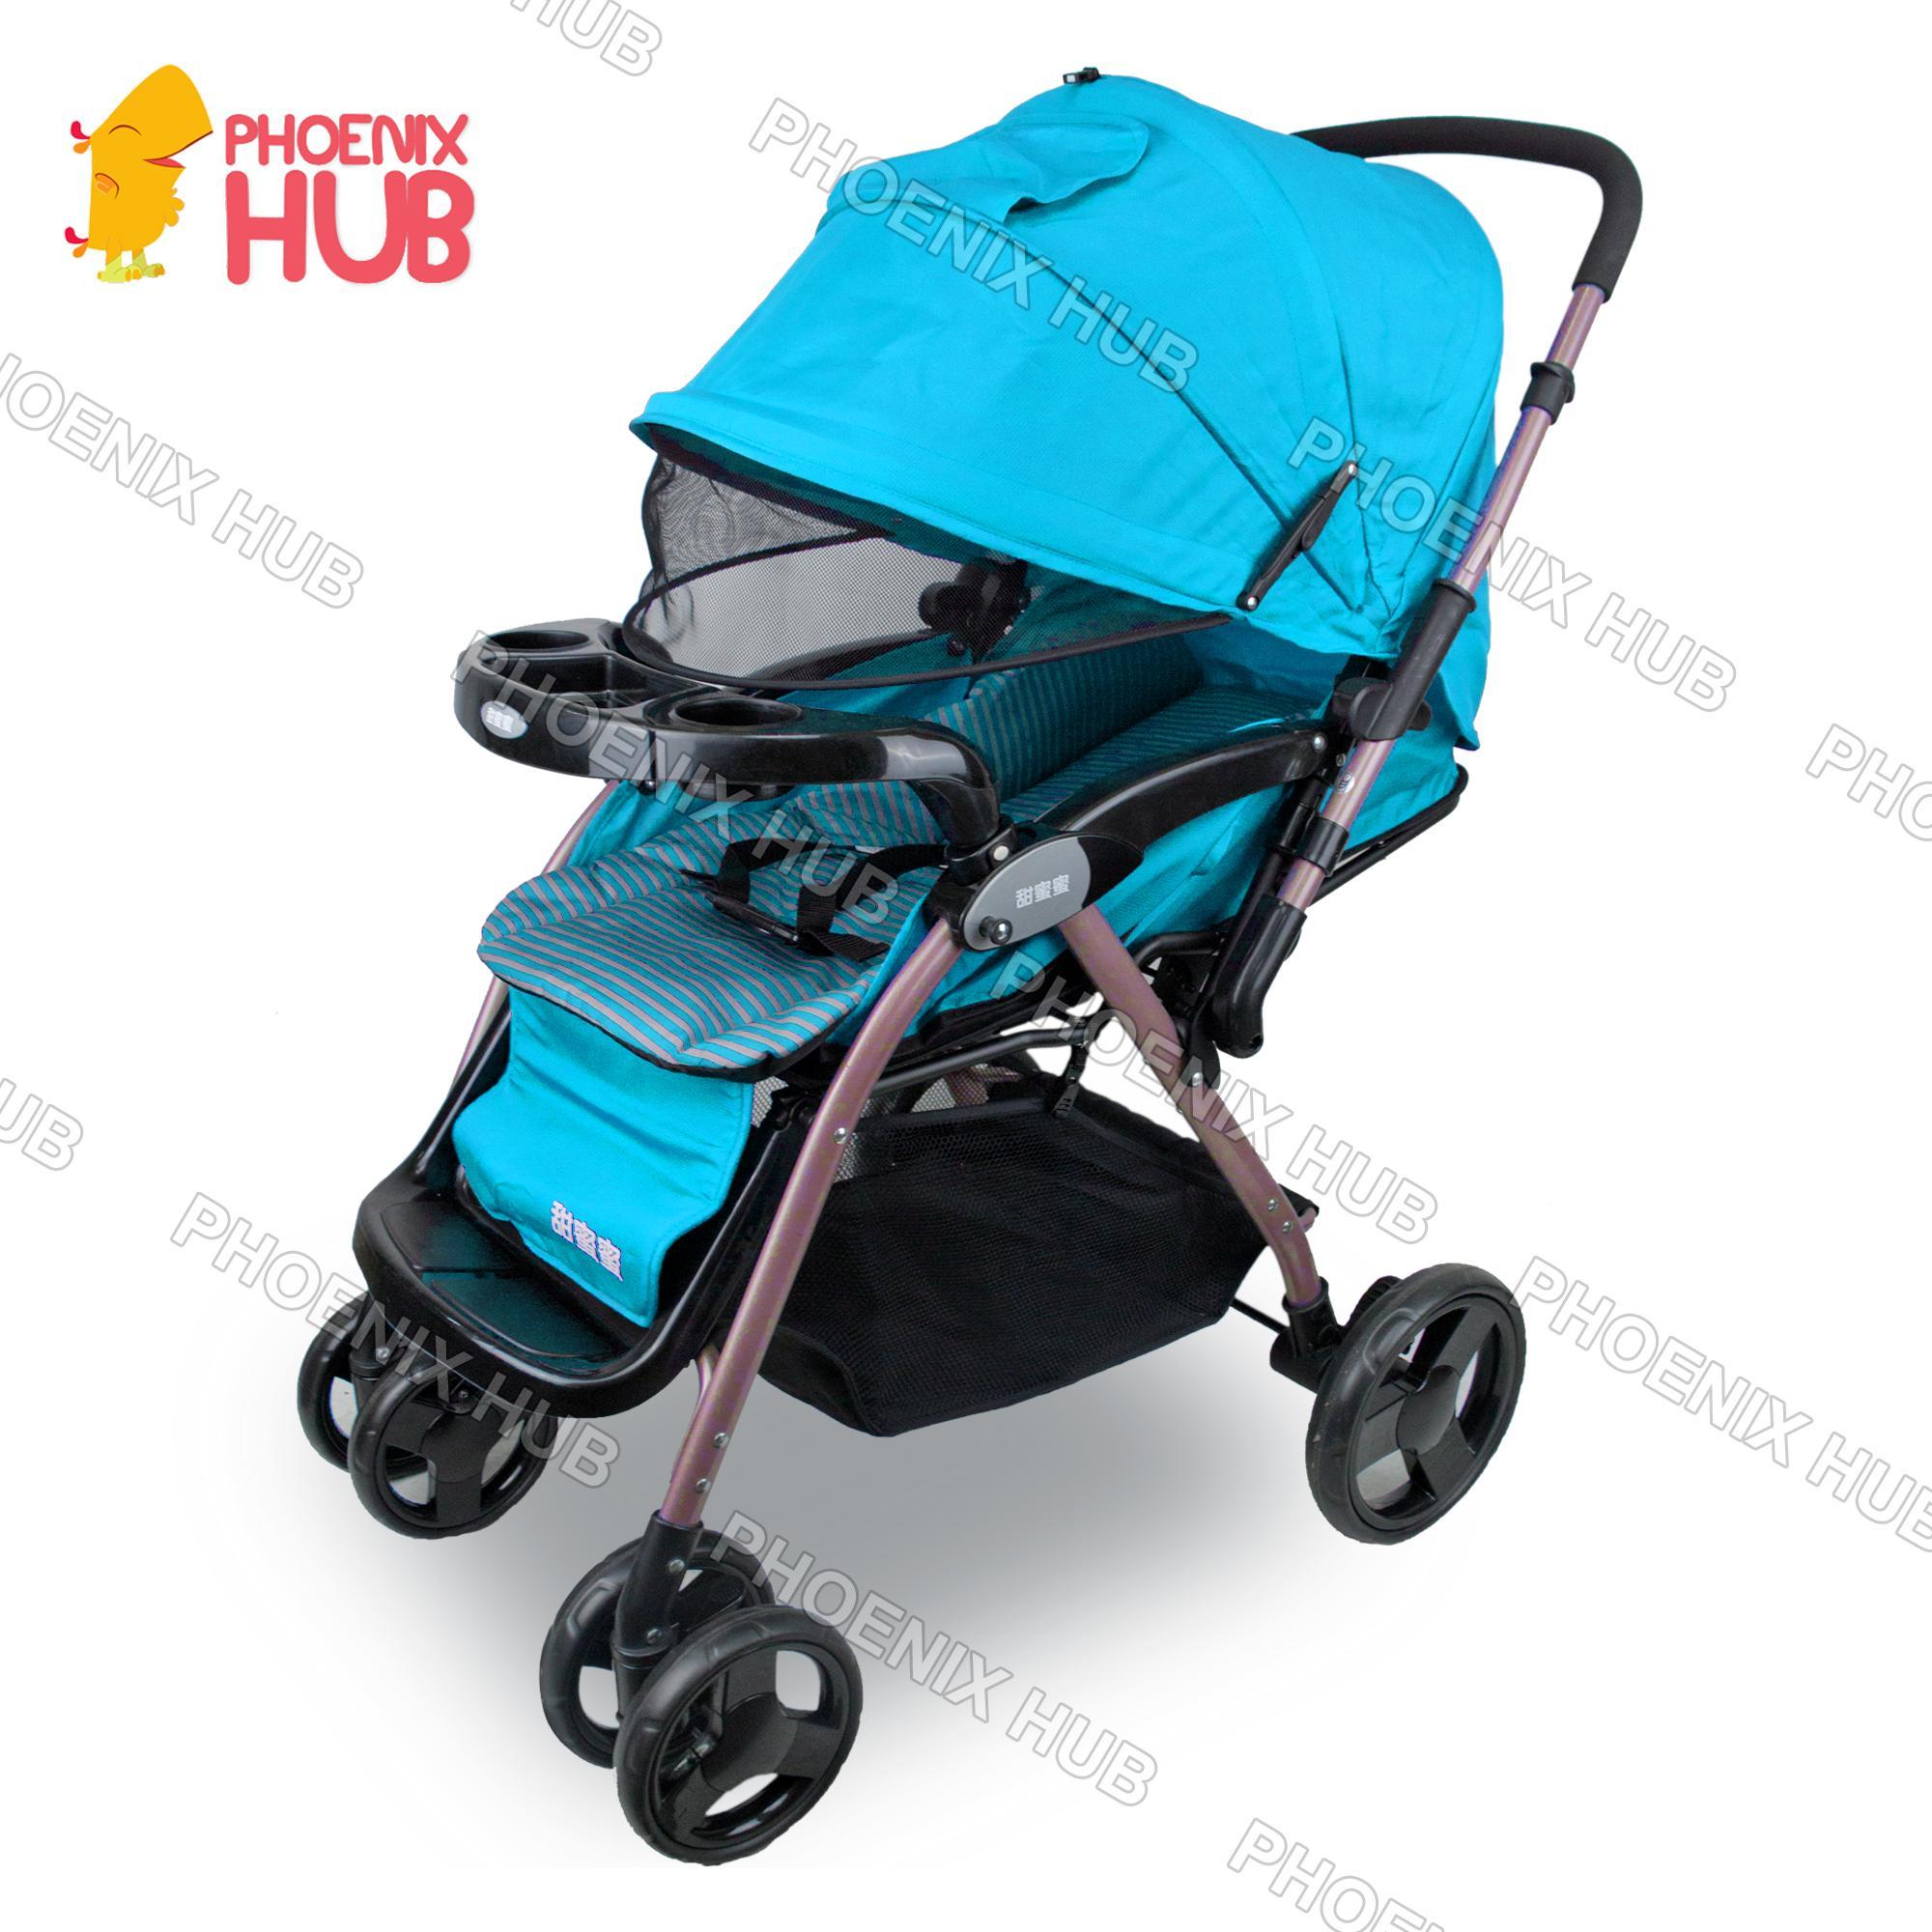 Justin C270a Stroller Foldable Stroller Push Chair Baby Trolley Baby Pram By Phoenix Hub.